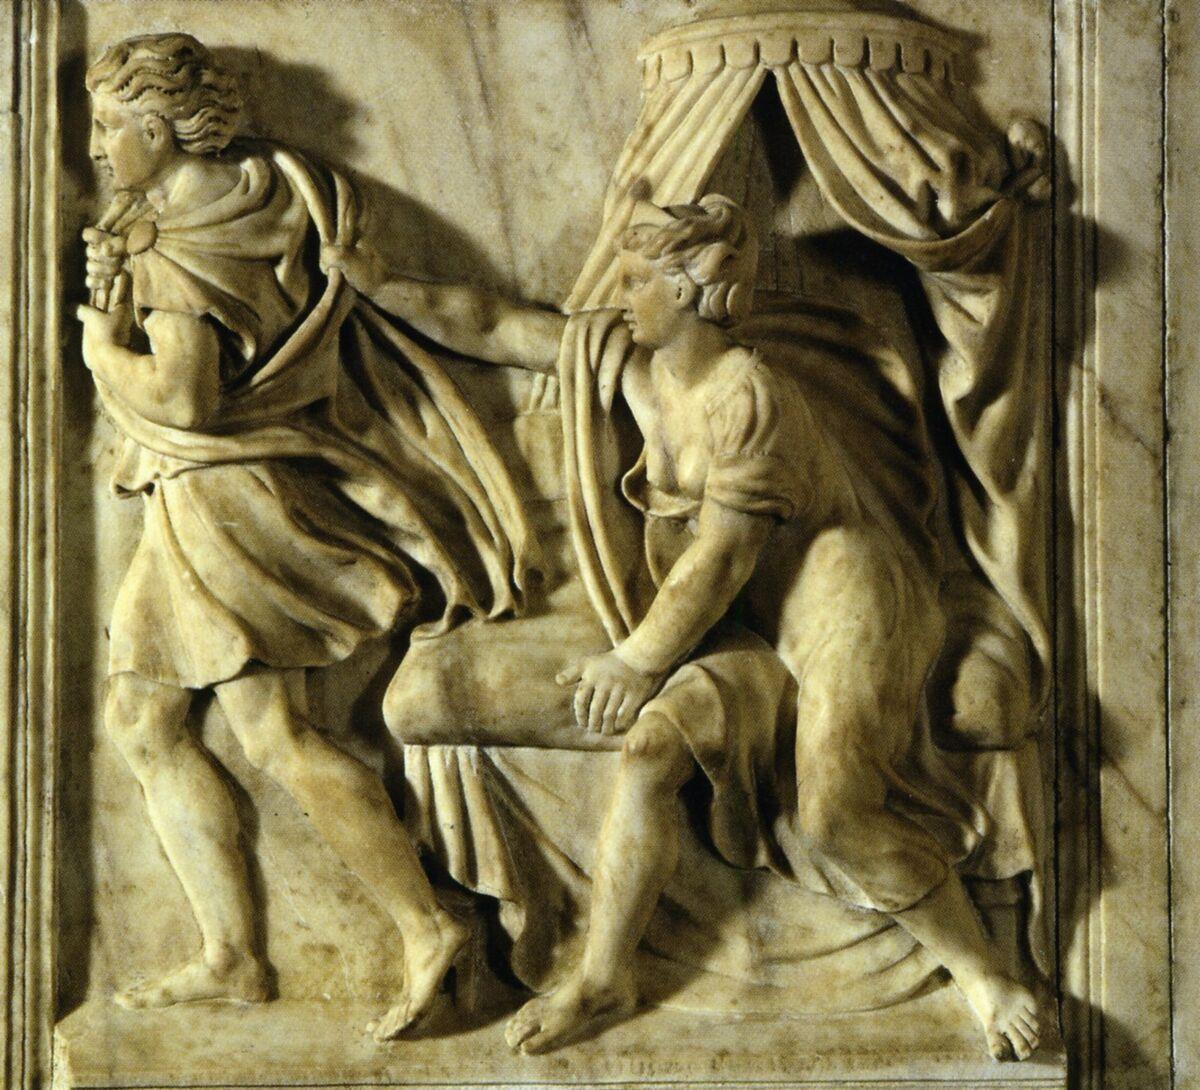 Properzia de' Rossi, Joseph and Potiphar's Wife at the Basilica di San Petronio Museum, Bologna, 1525-26. Courtesy of Irene Graziani at the University of Bologna.